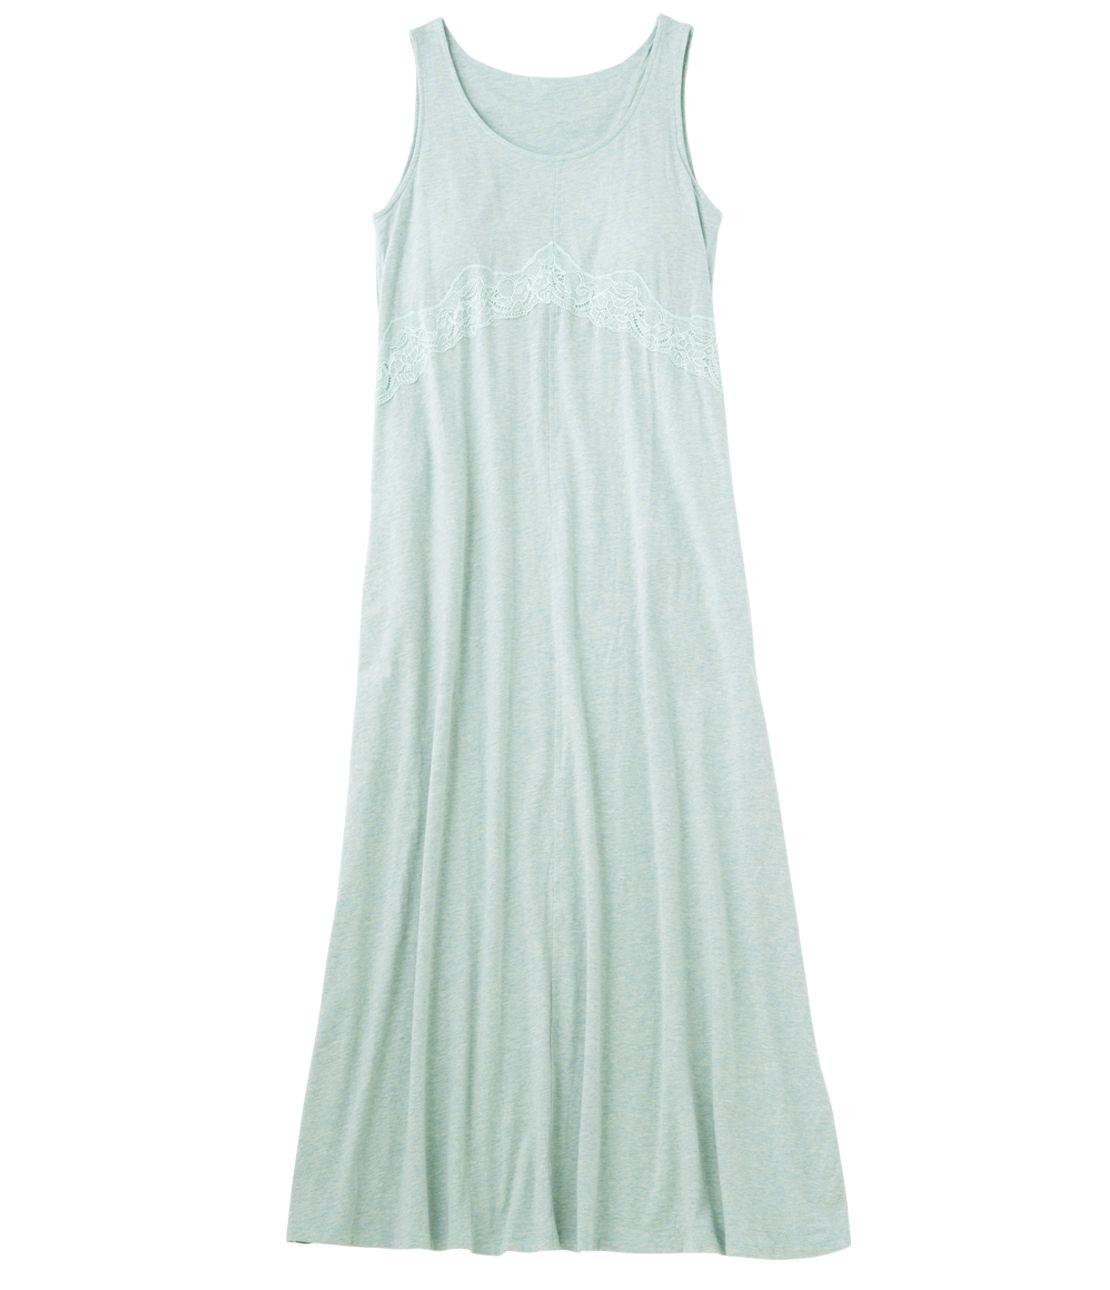 Flower path debt maxi dress to wear